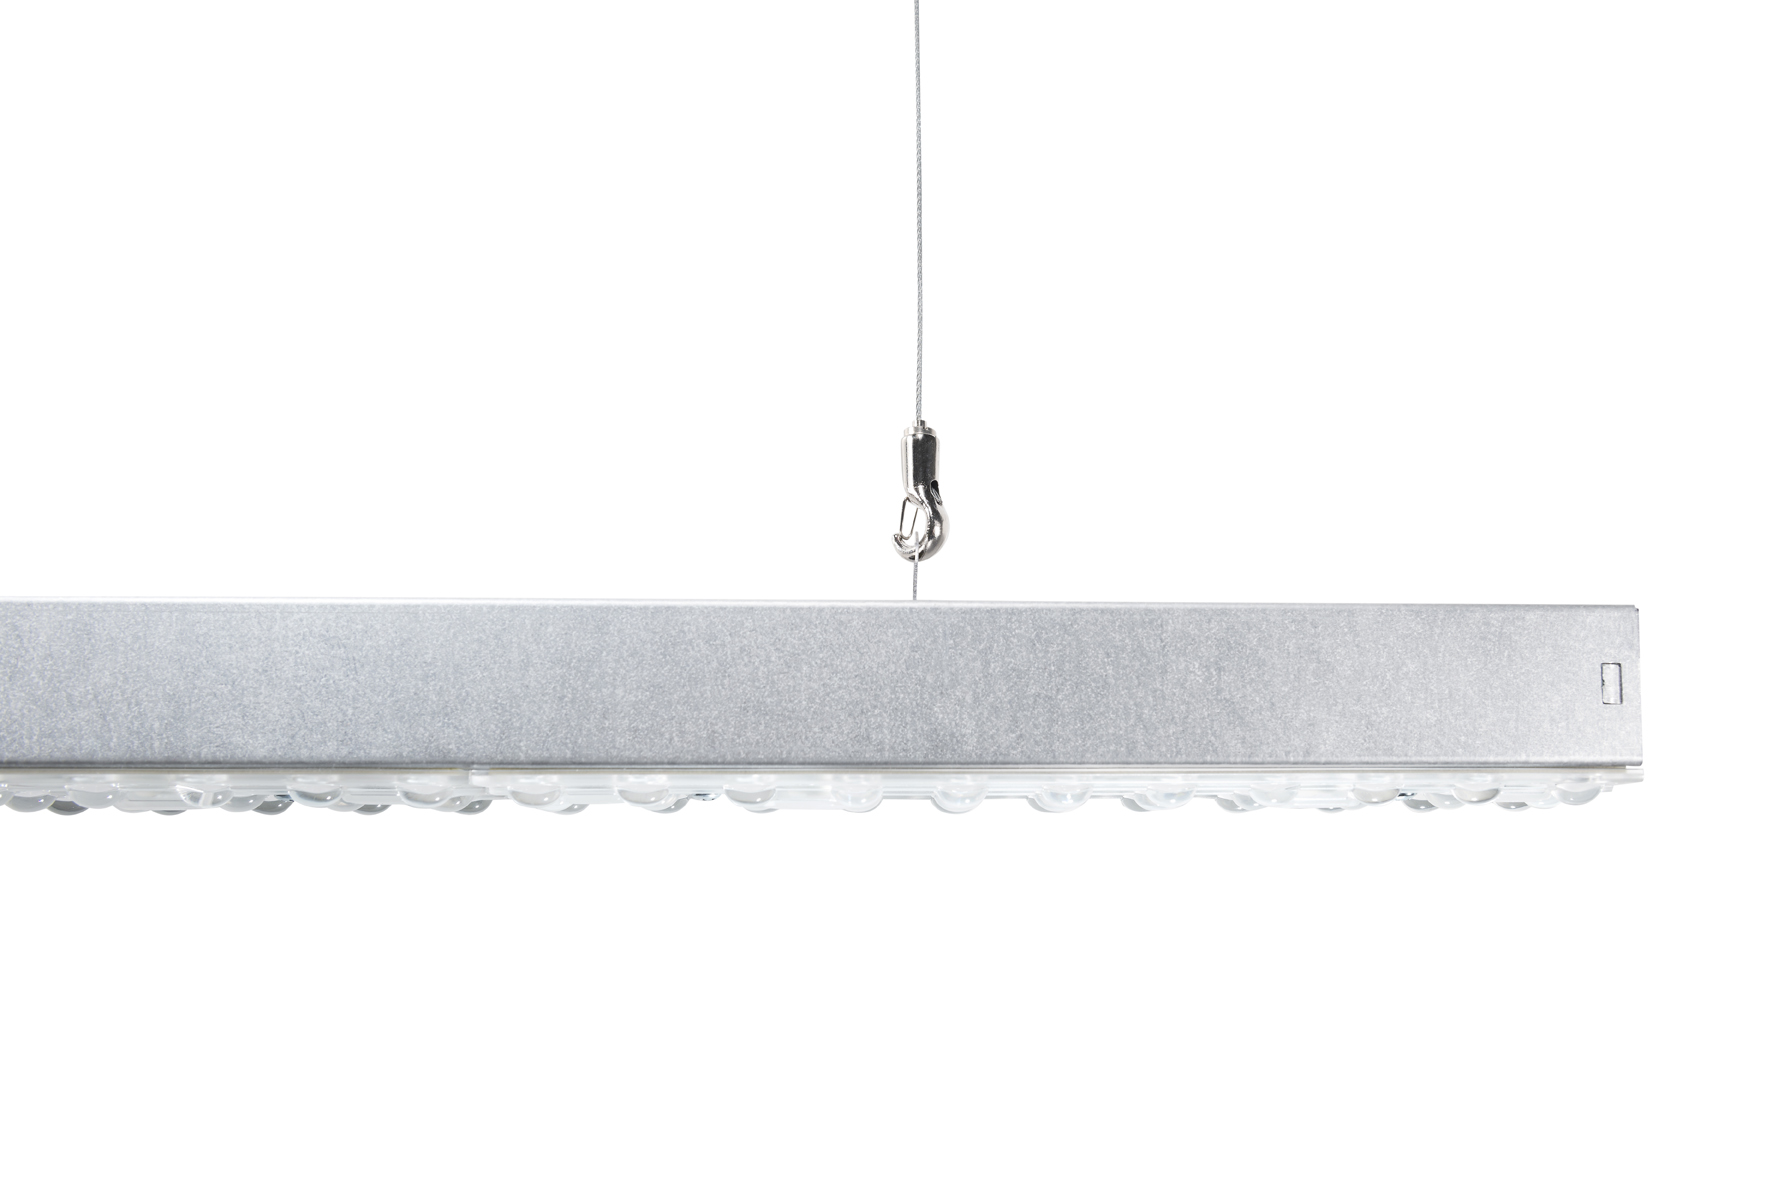 lucid linea plus lights 4 europe gmbh co kg switch it on led beleuchtungen. Black Bedroom Furniture Sets. Home Design Ideas